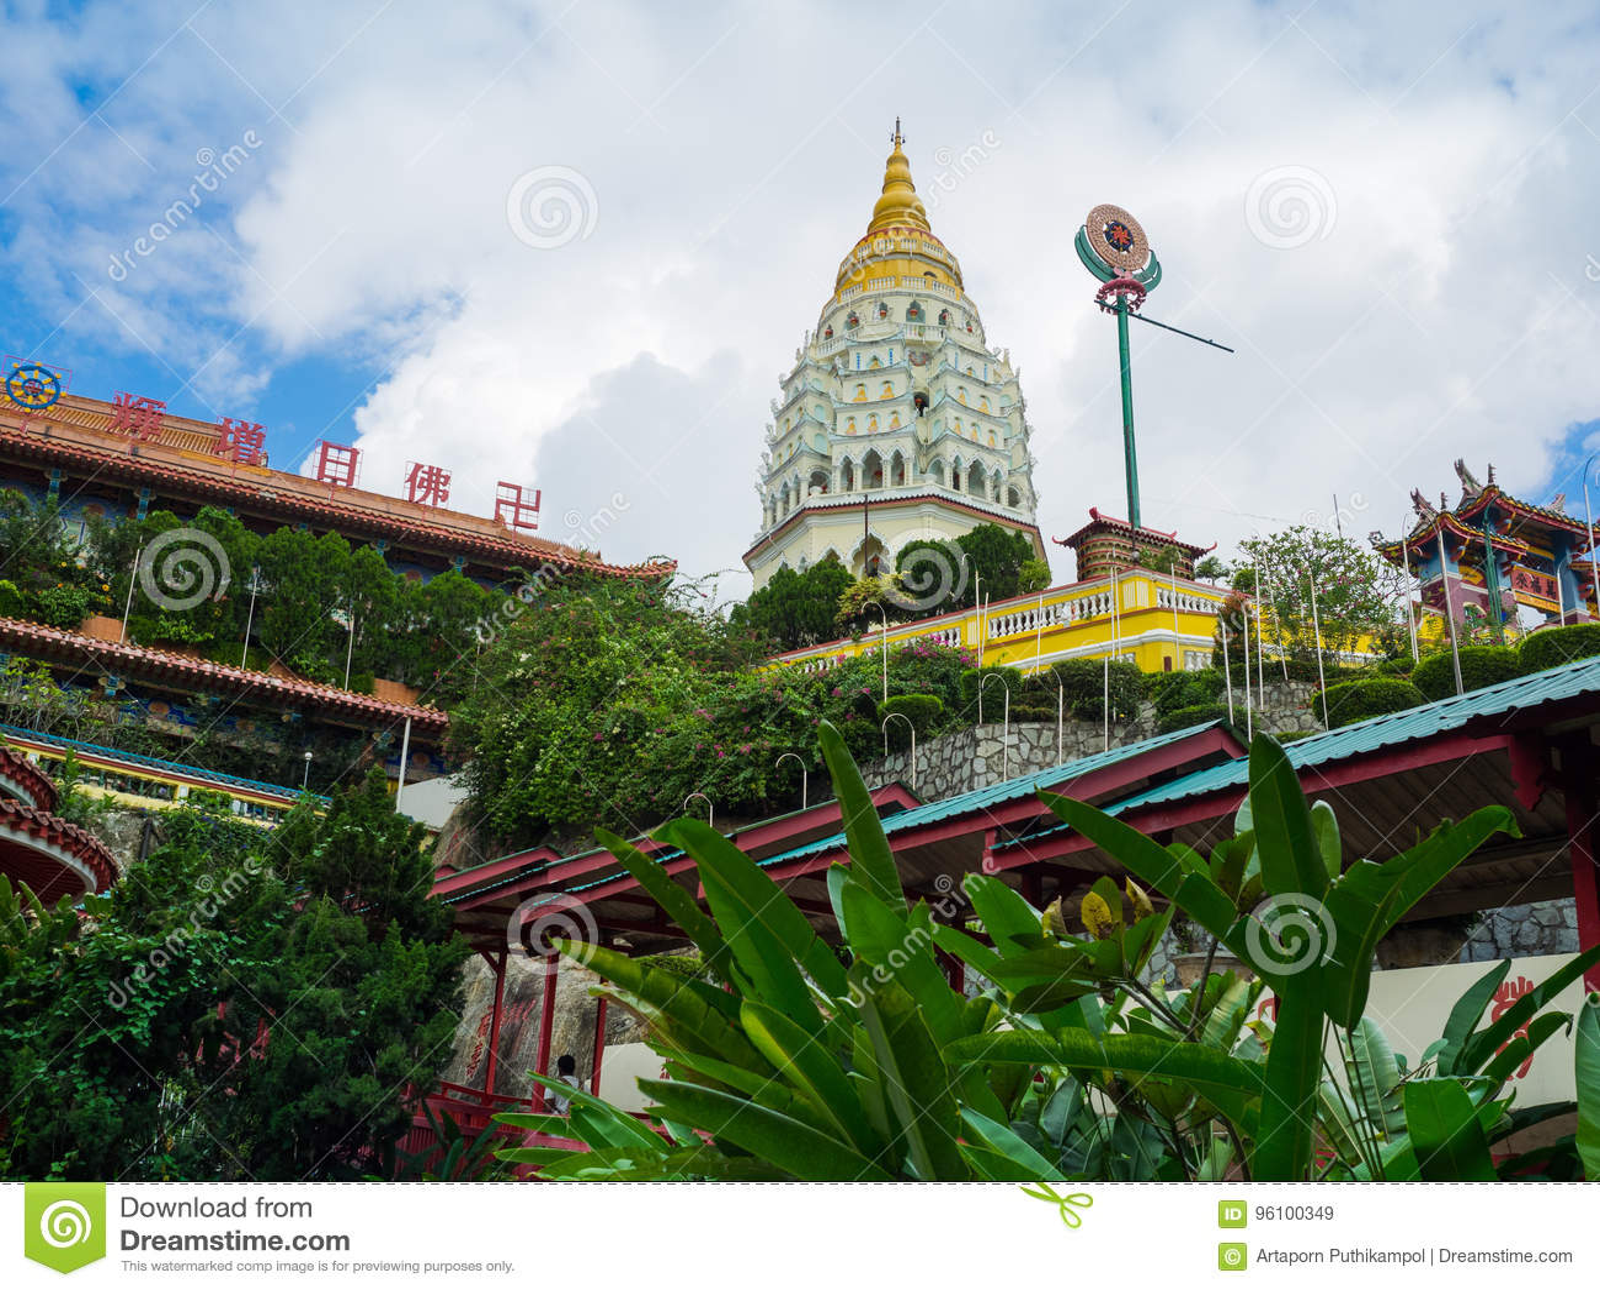 Kek Lok Si Temple i Georgetown, Penang, Malaysia